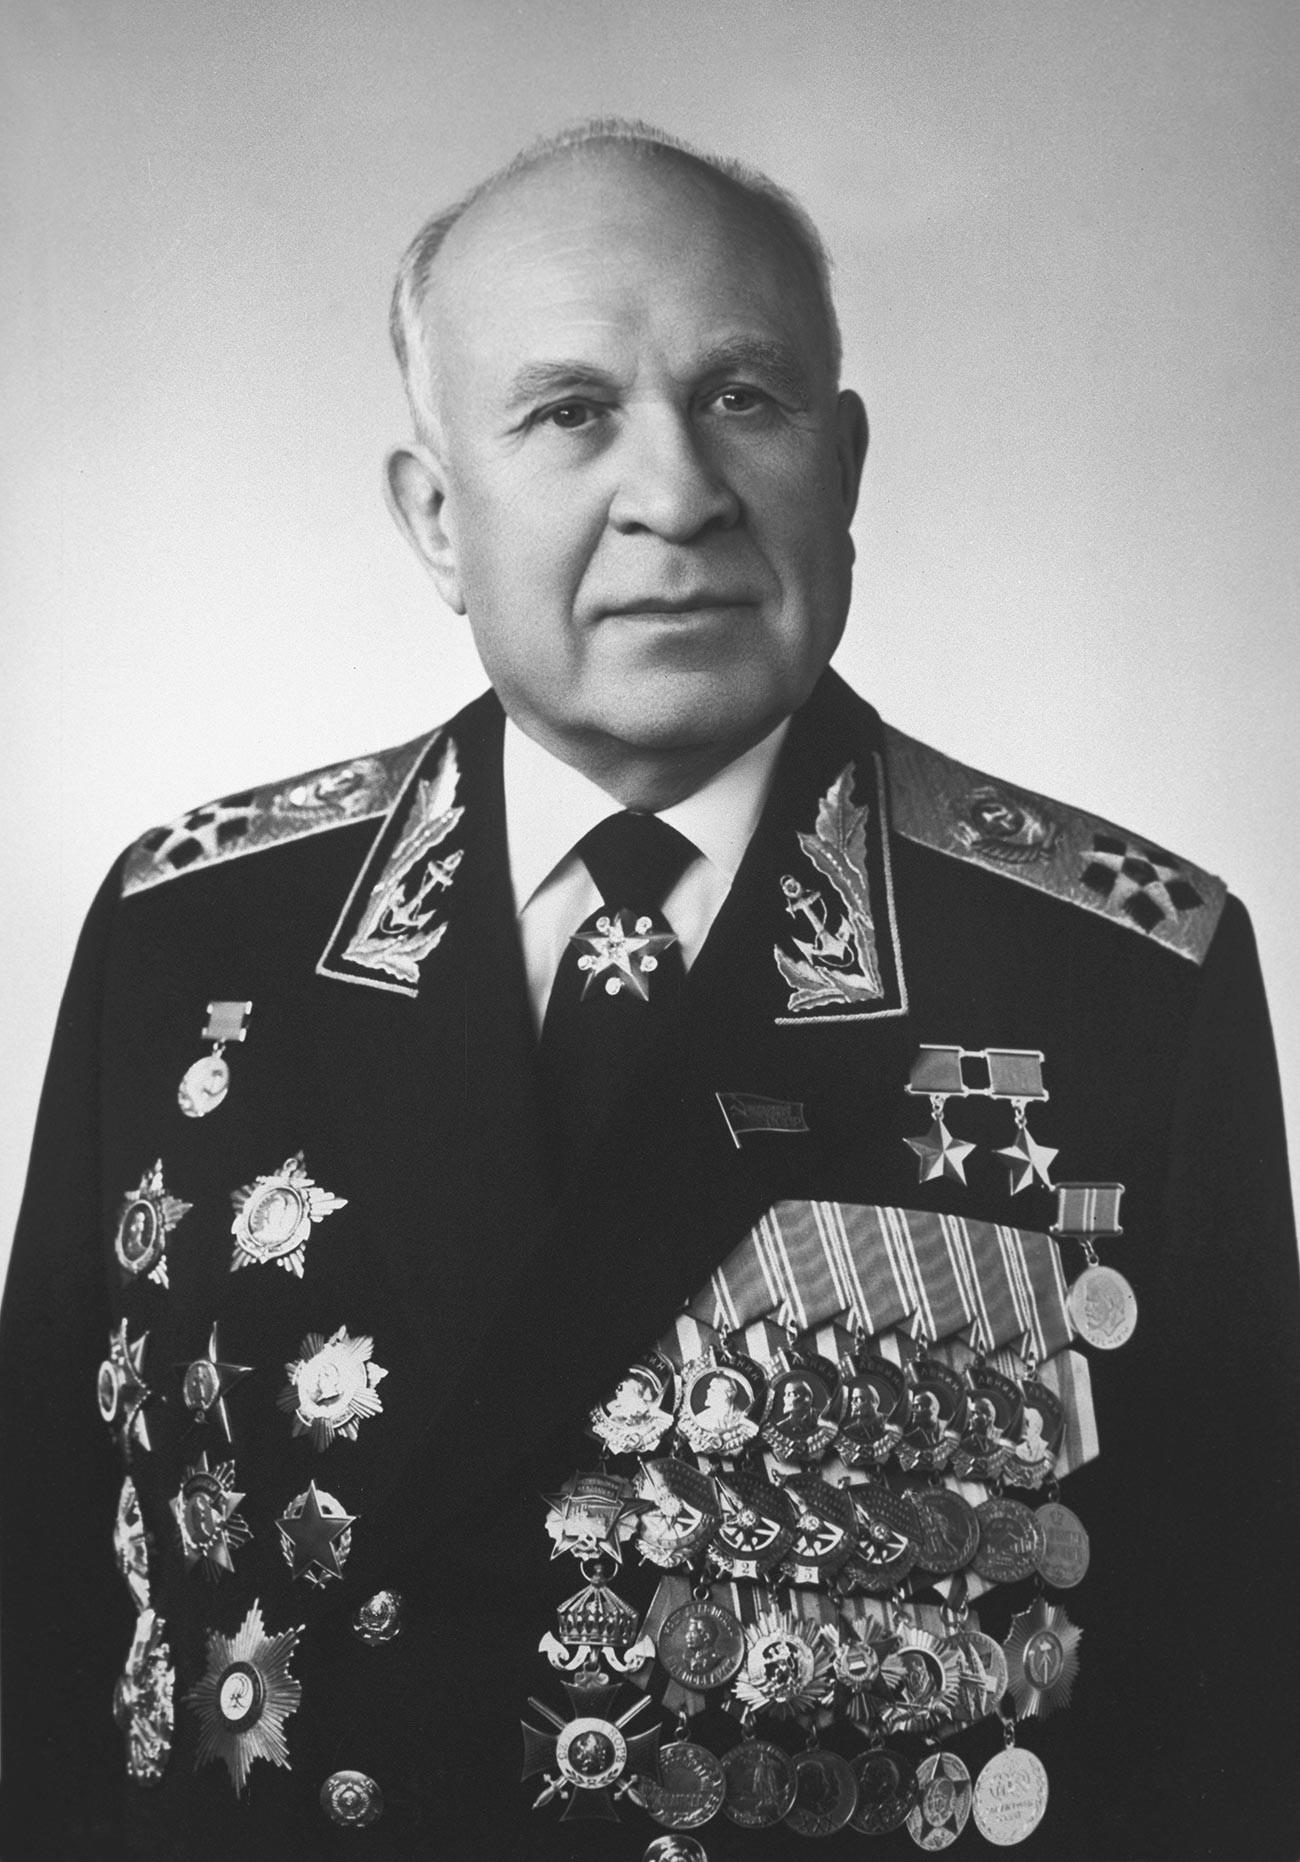 Admiral of the Fleet, Hero of the Soviet Union Sergey Gorshkov.